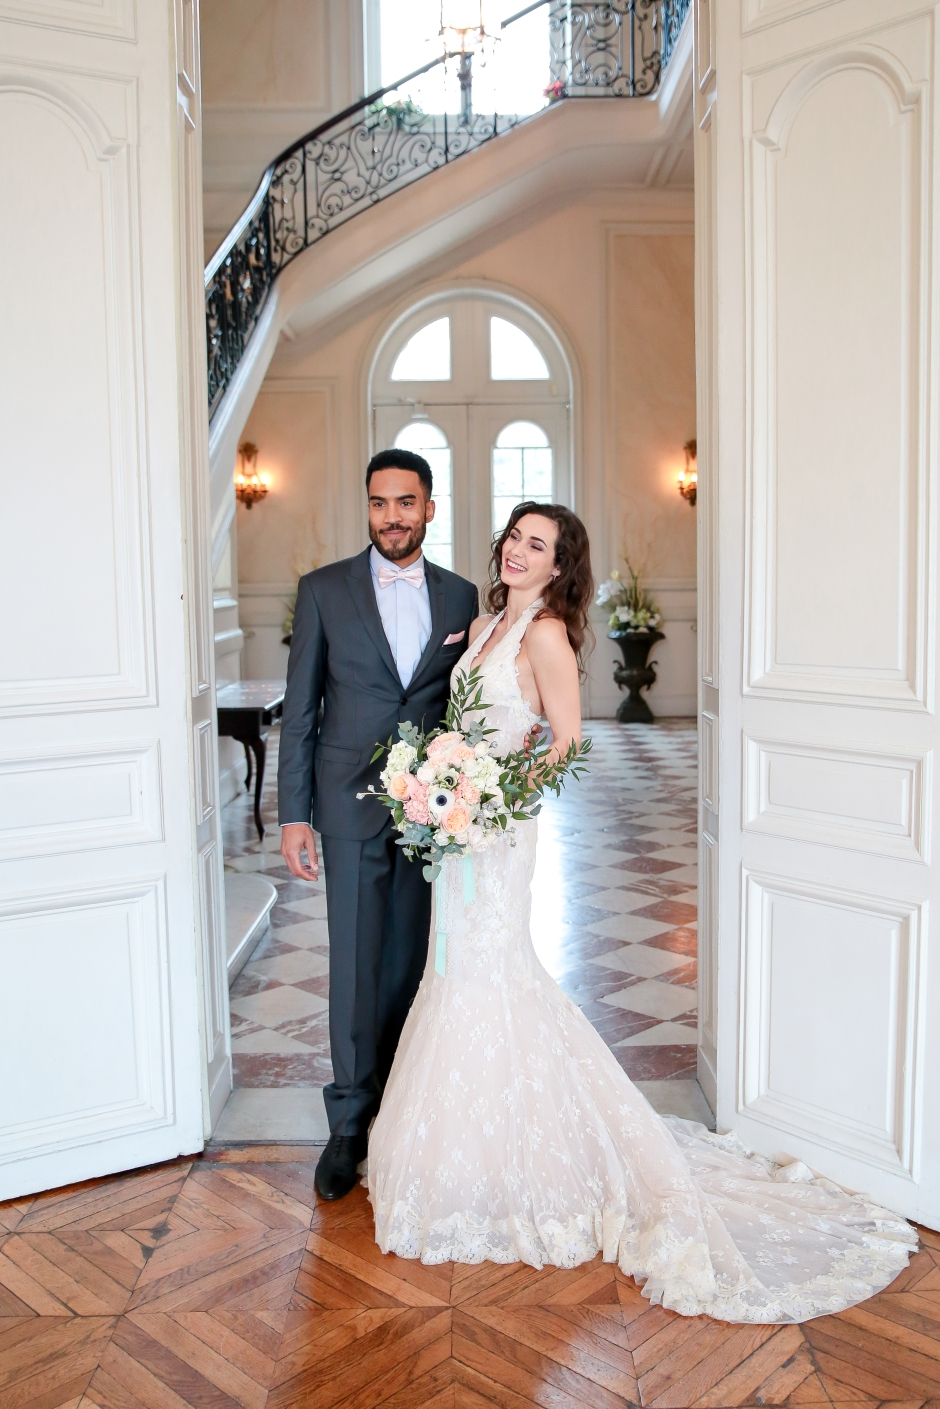 Mariage nude au Chateau de Santeny - La Blogueuse Mariage (18)